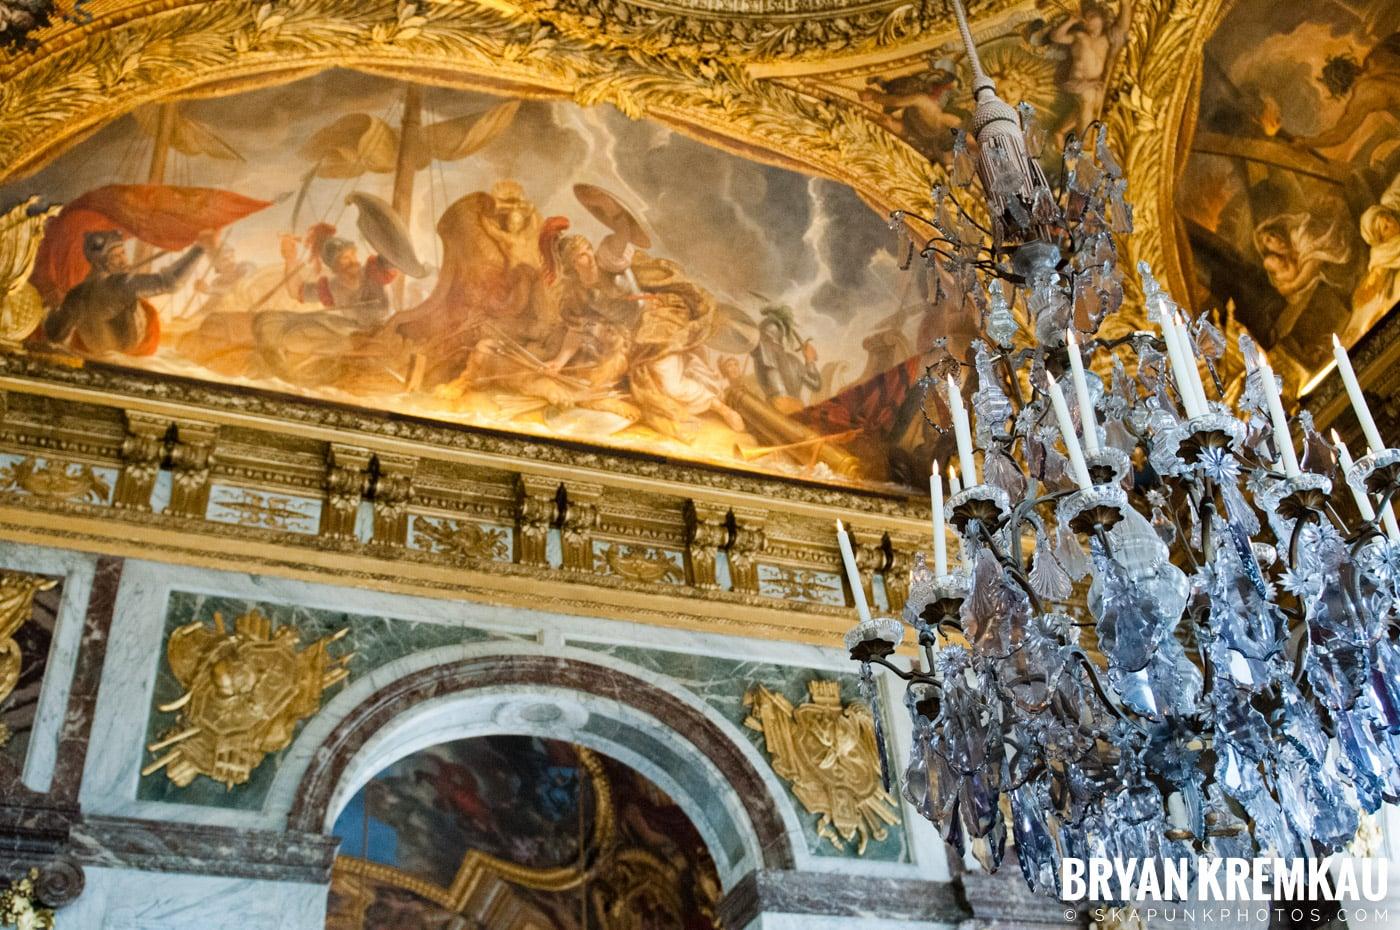 Paris, France Honeymoon - Day 2 - 7.19.11 (35)